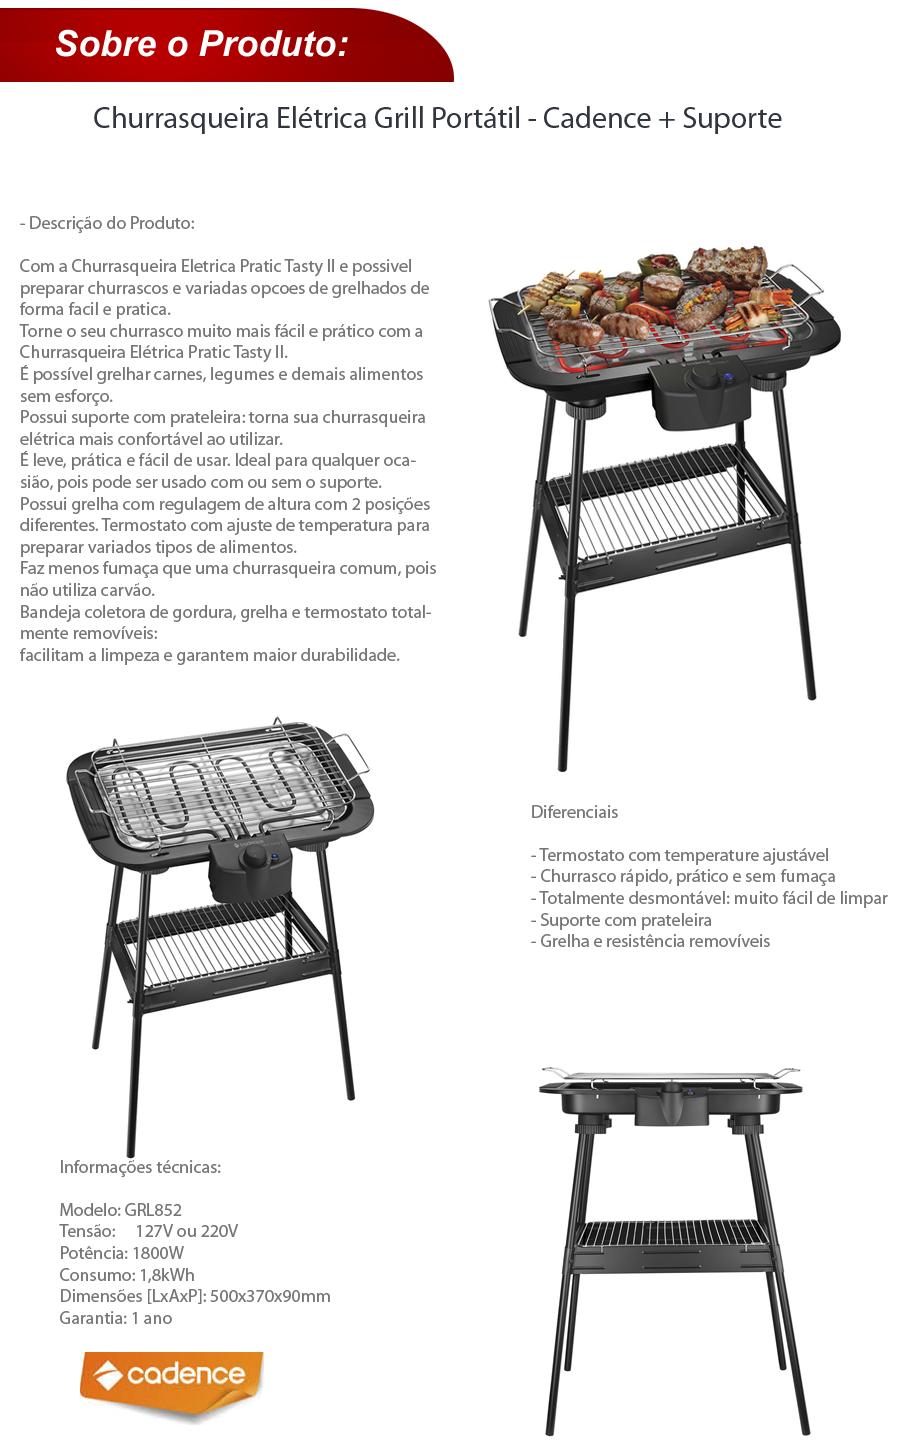 Churrasqueira Elétrica Grill Portátil - Cadence + Suporte